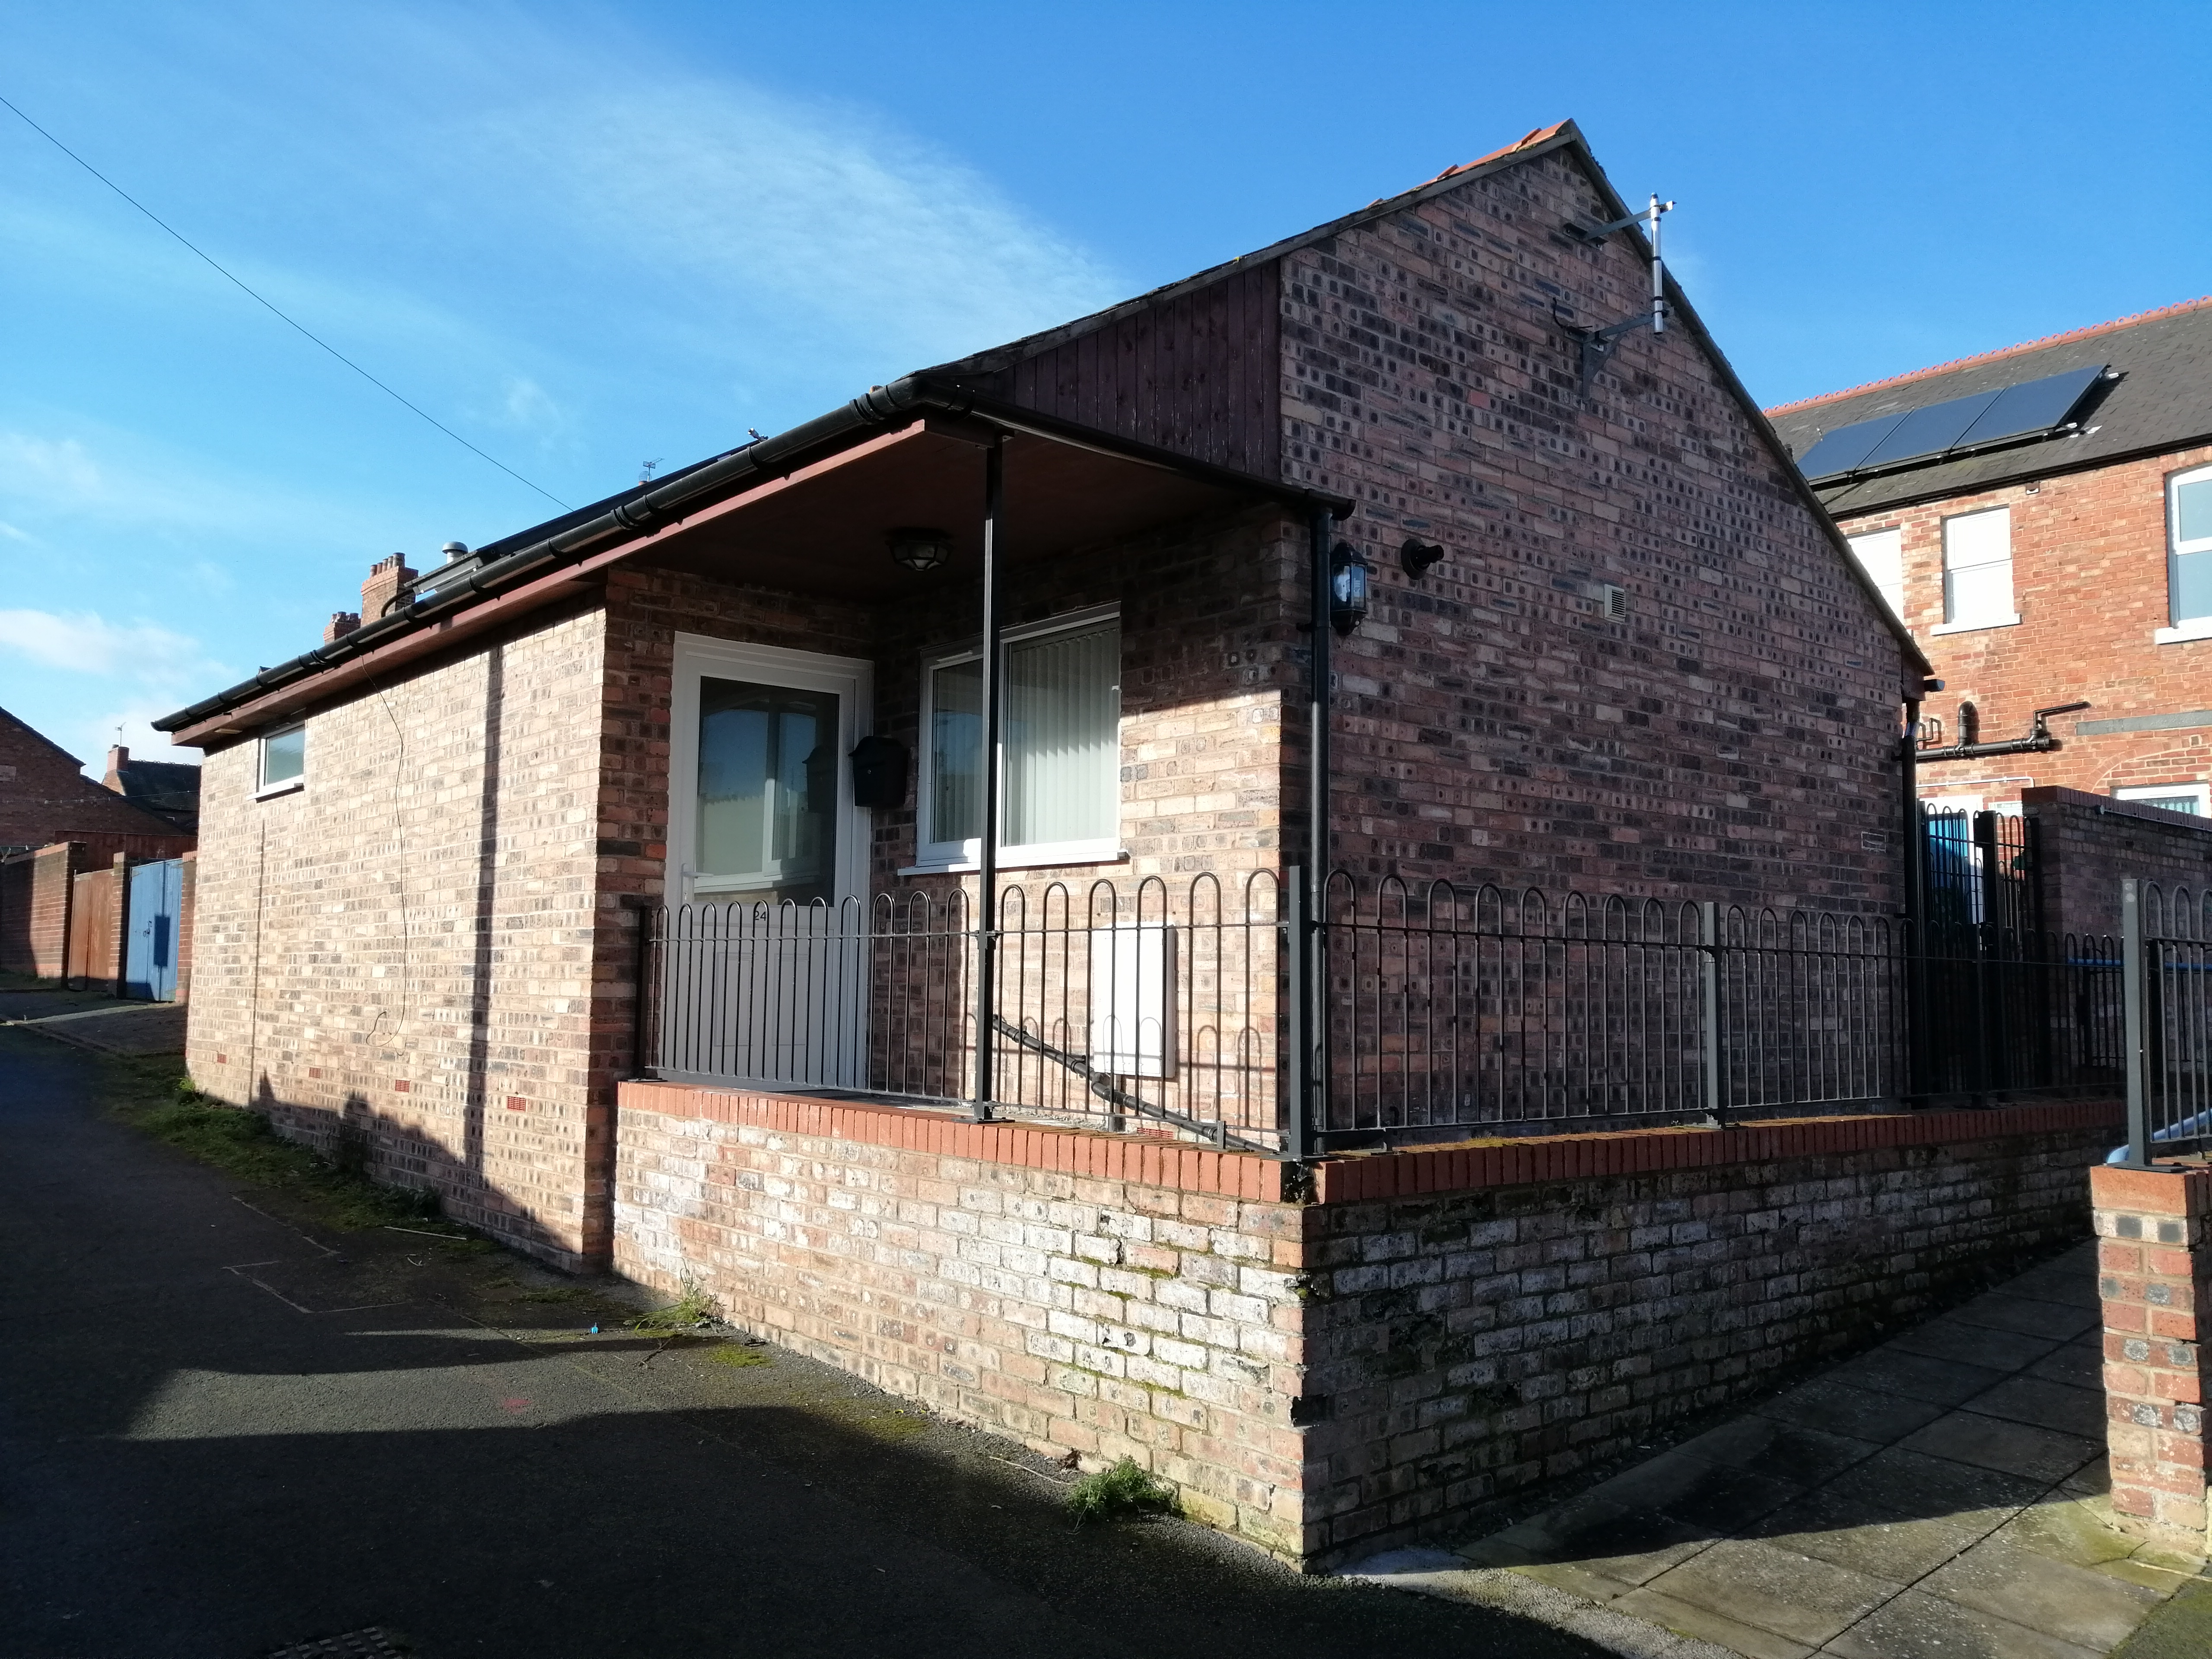 Exterior of Ryeland Street home